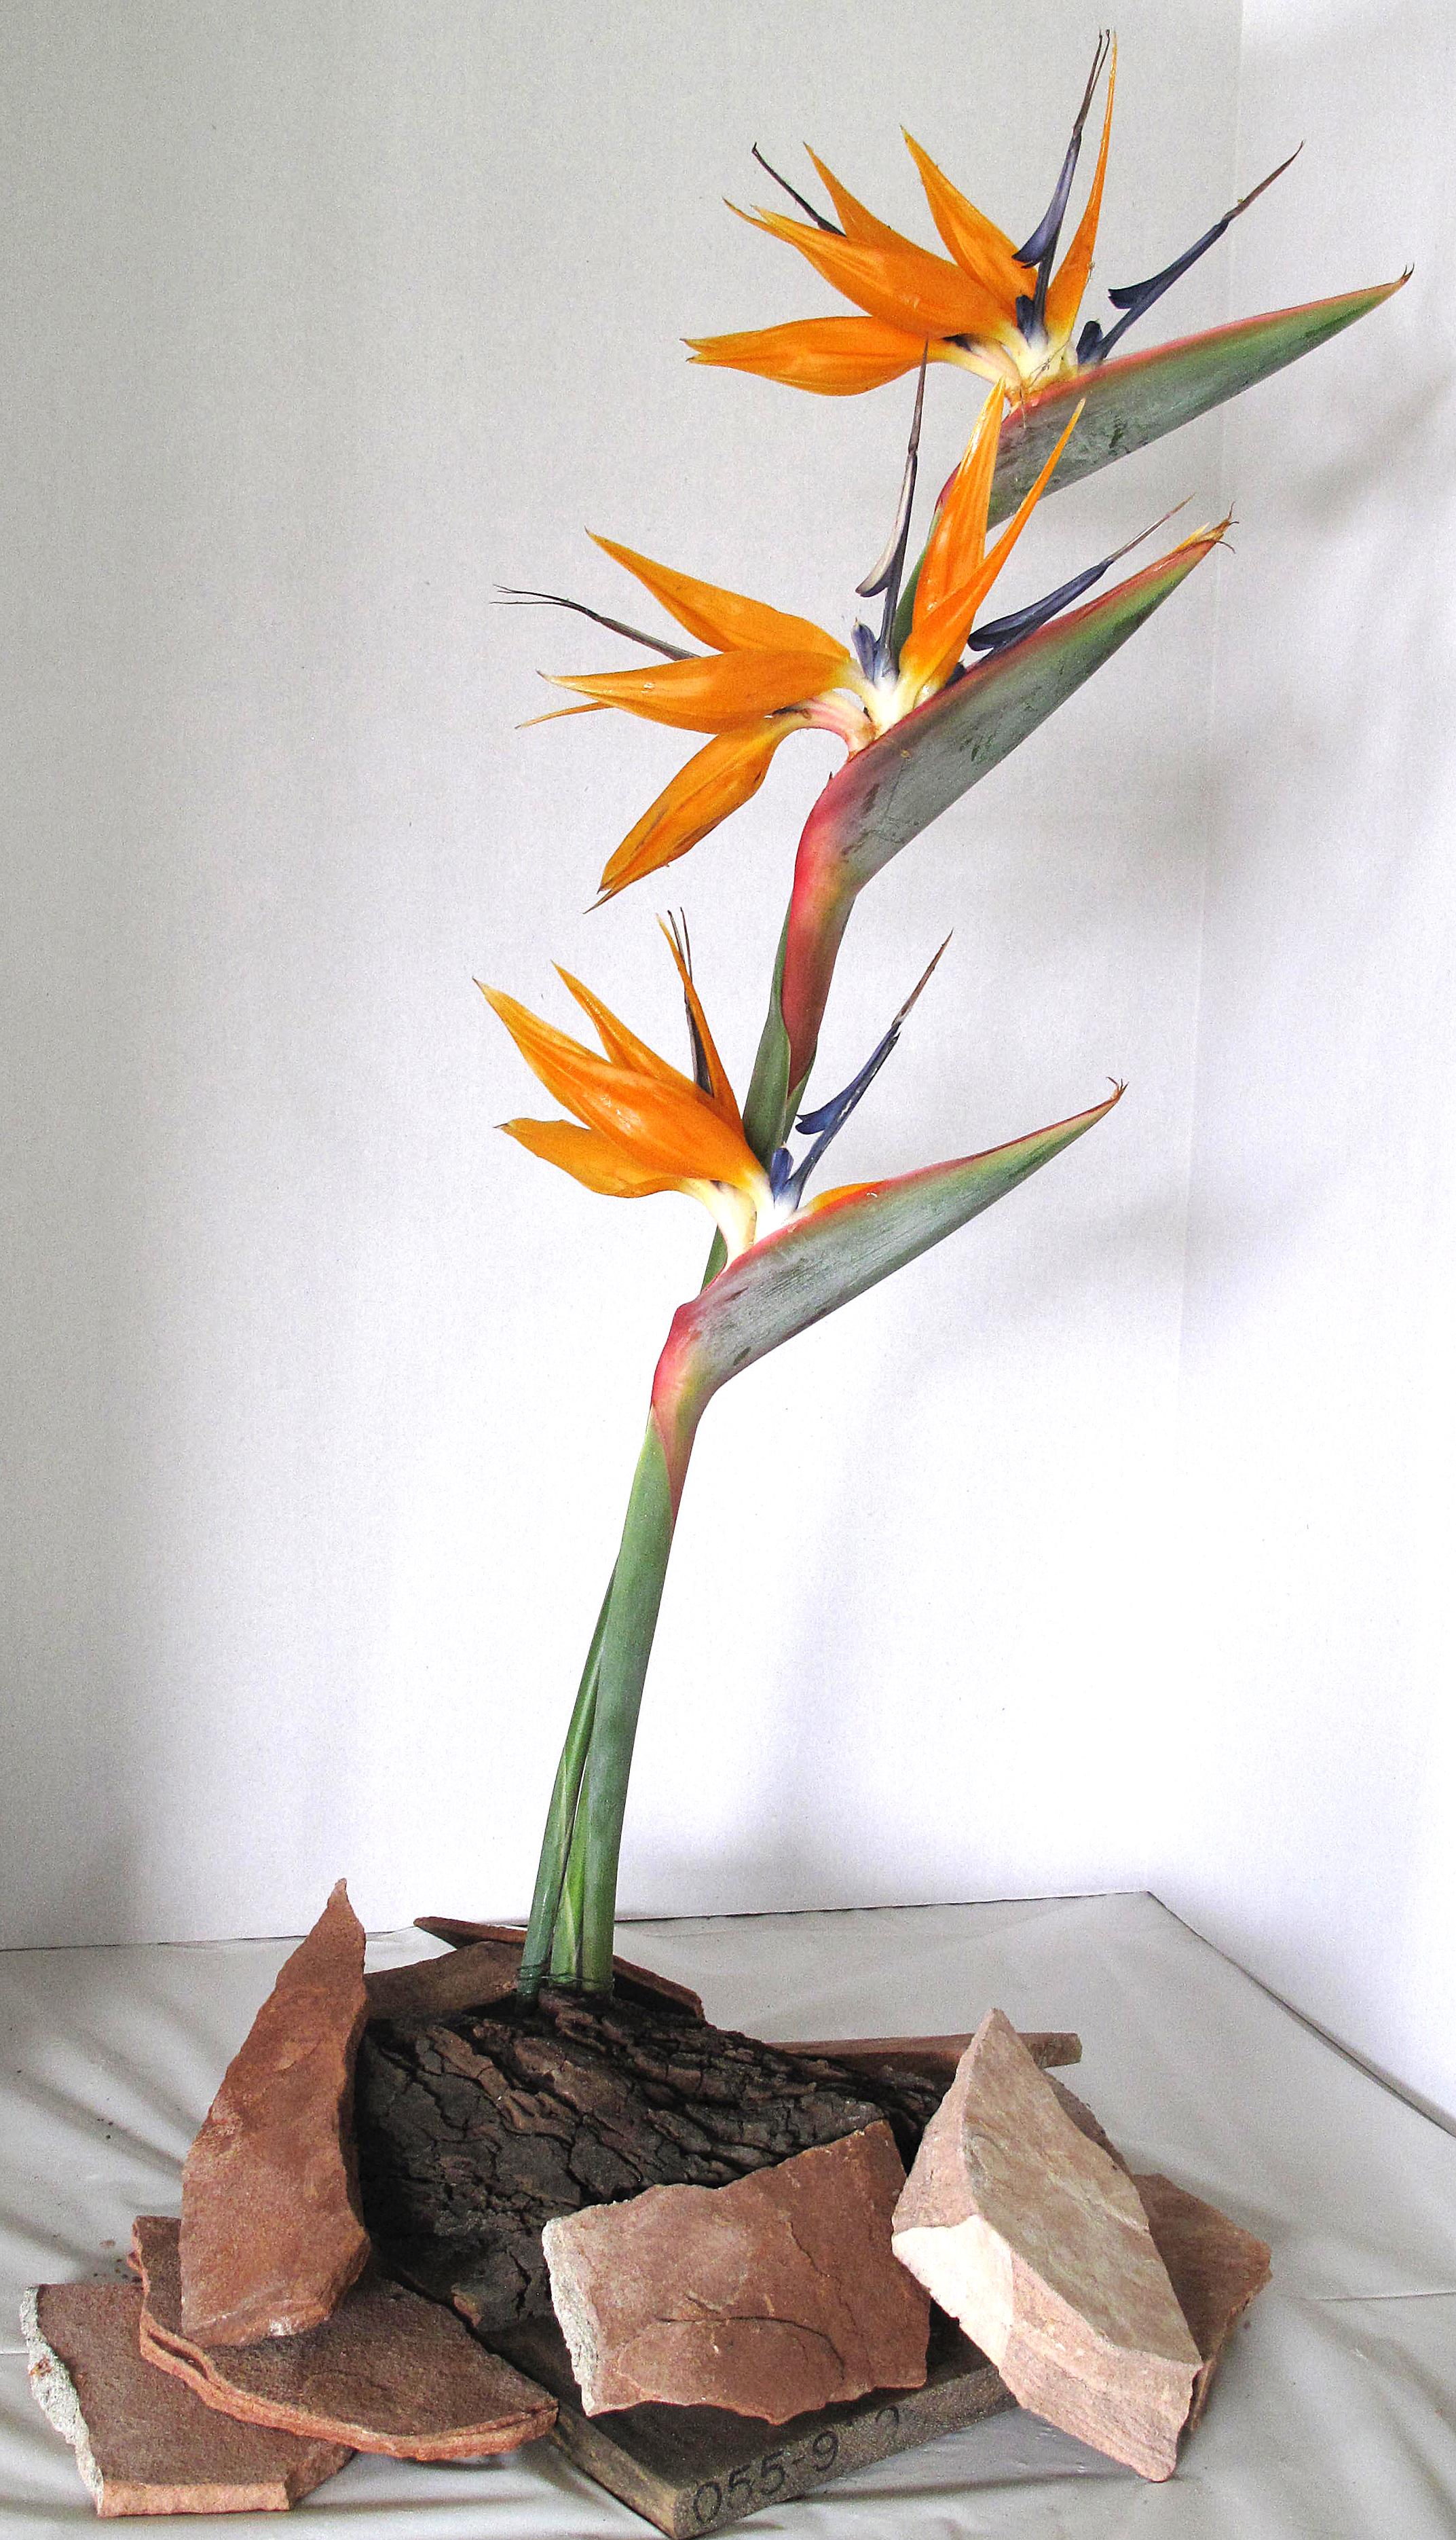 LAGC Flower Show 2013